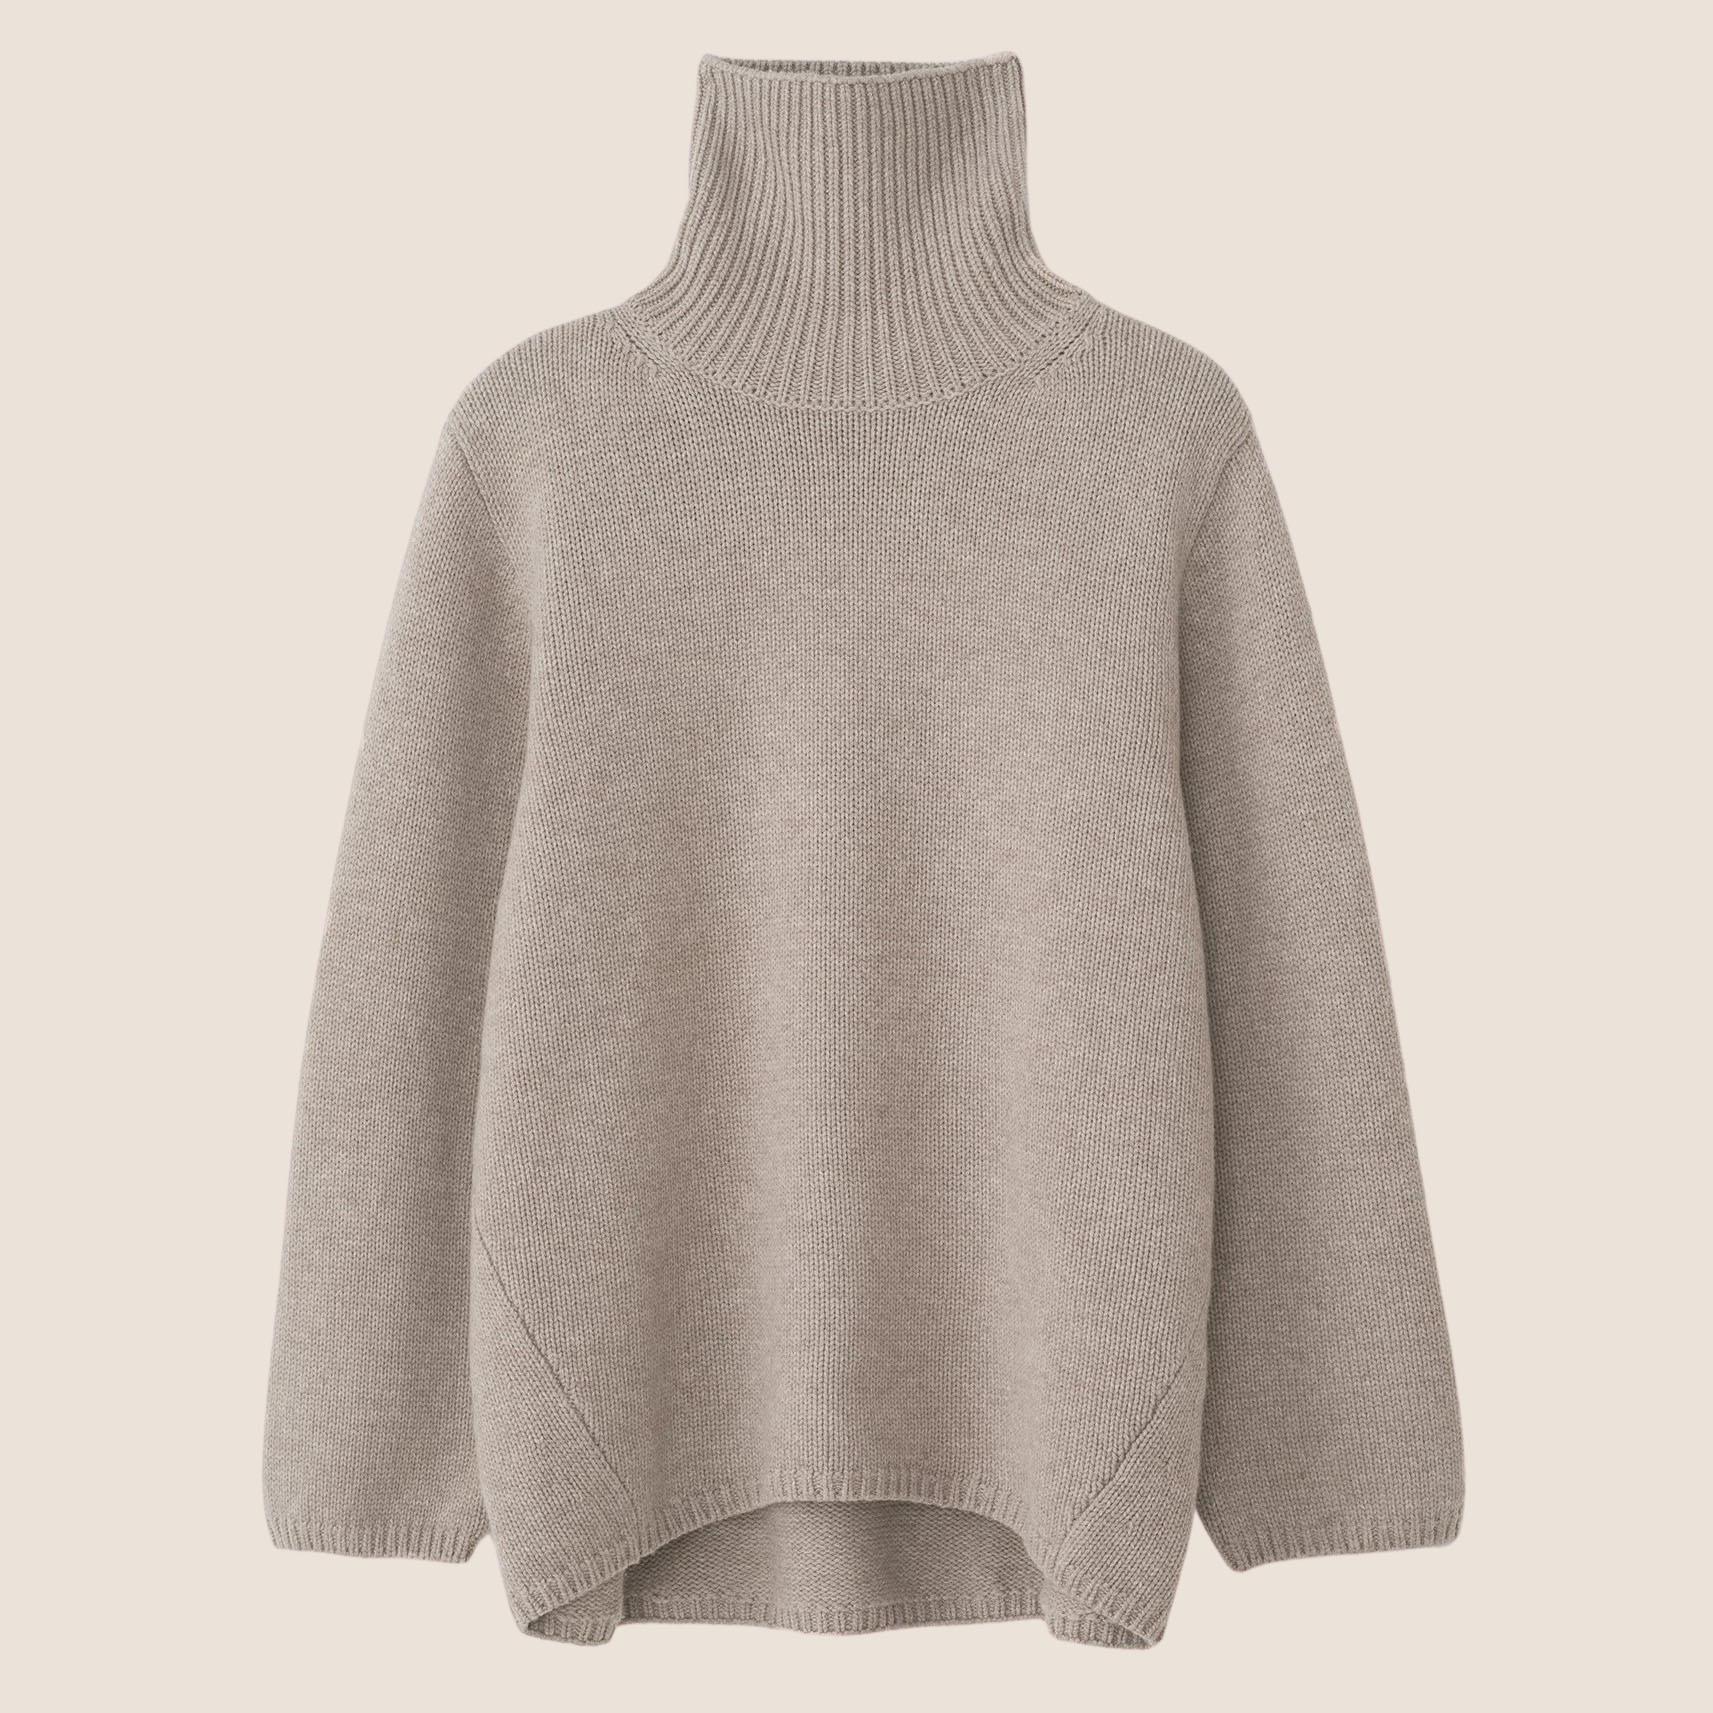 Cambridge Sweater